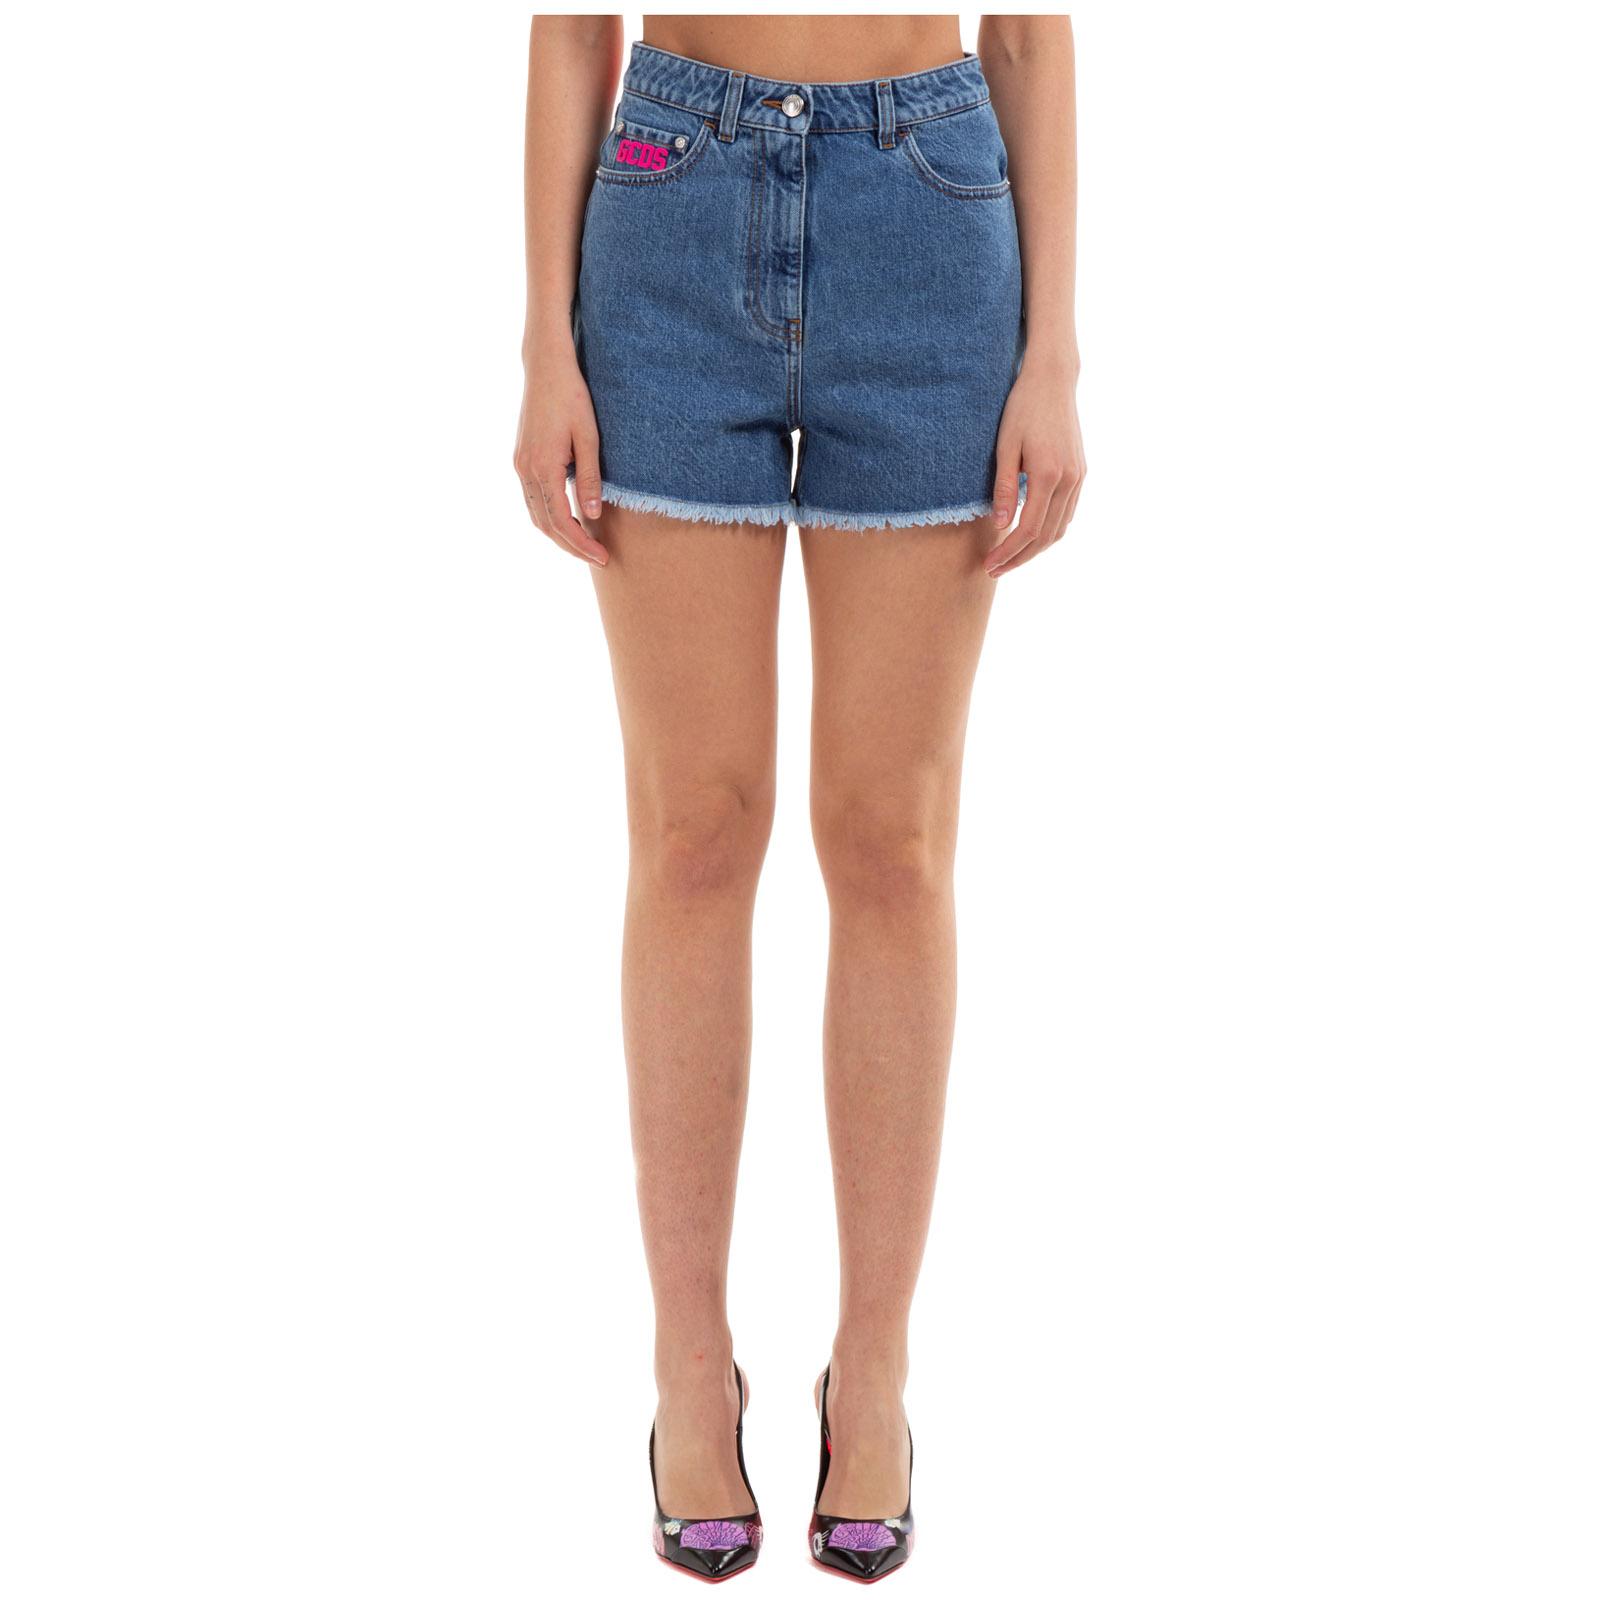 Women's shorts jeans denim summer